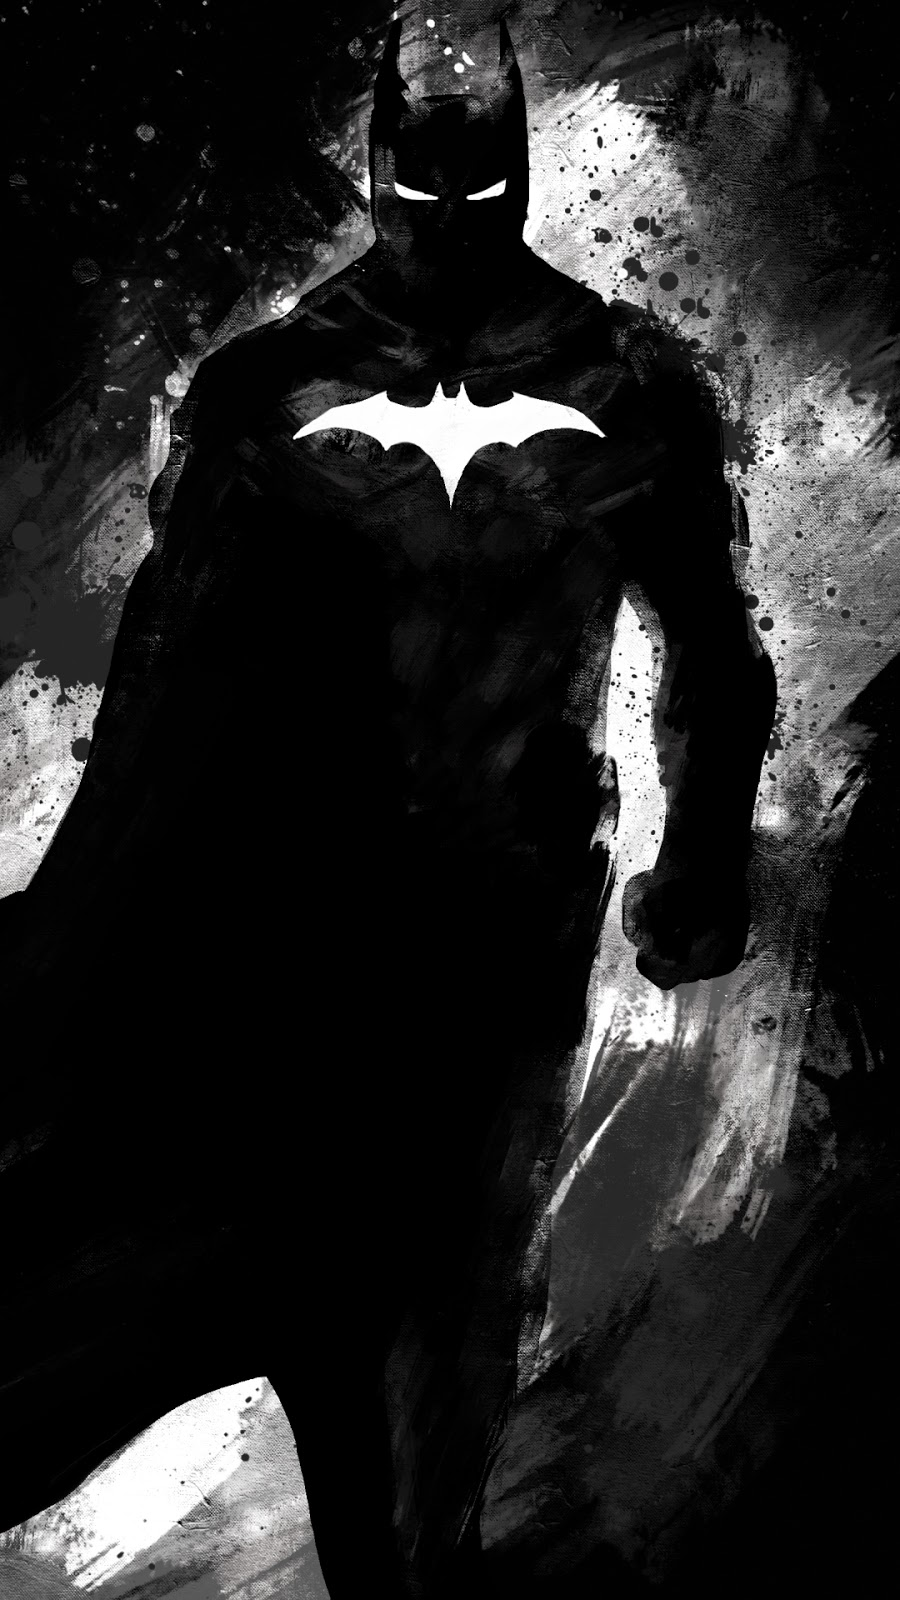 Batman Digital Art Black & White